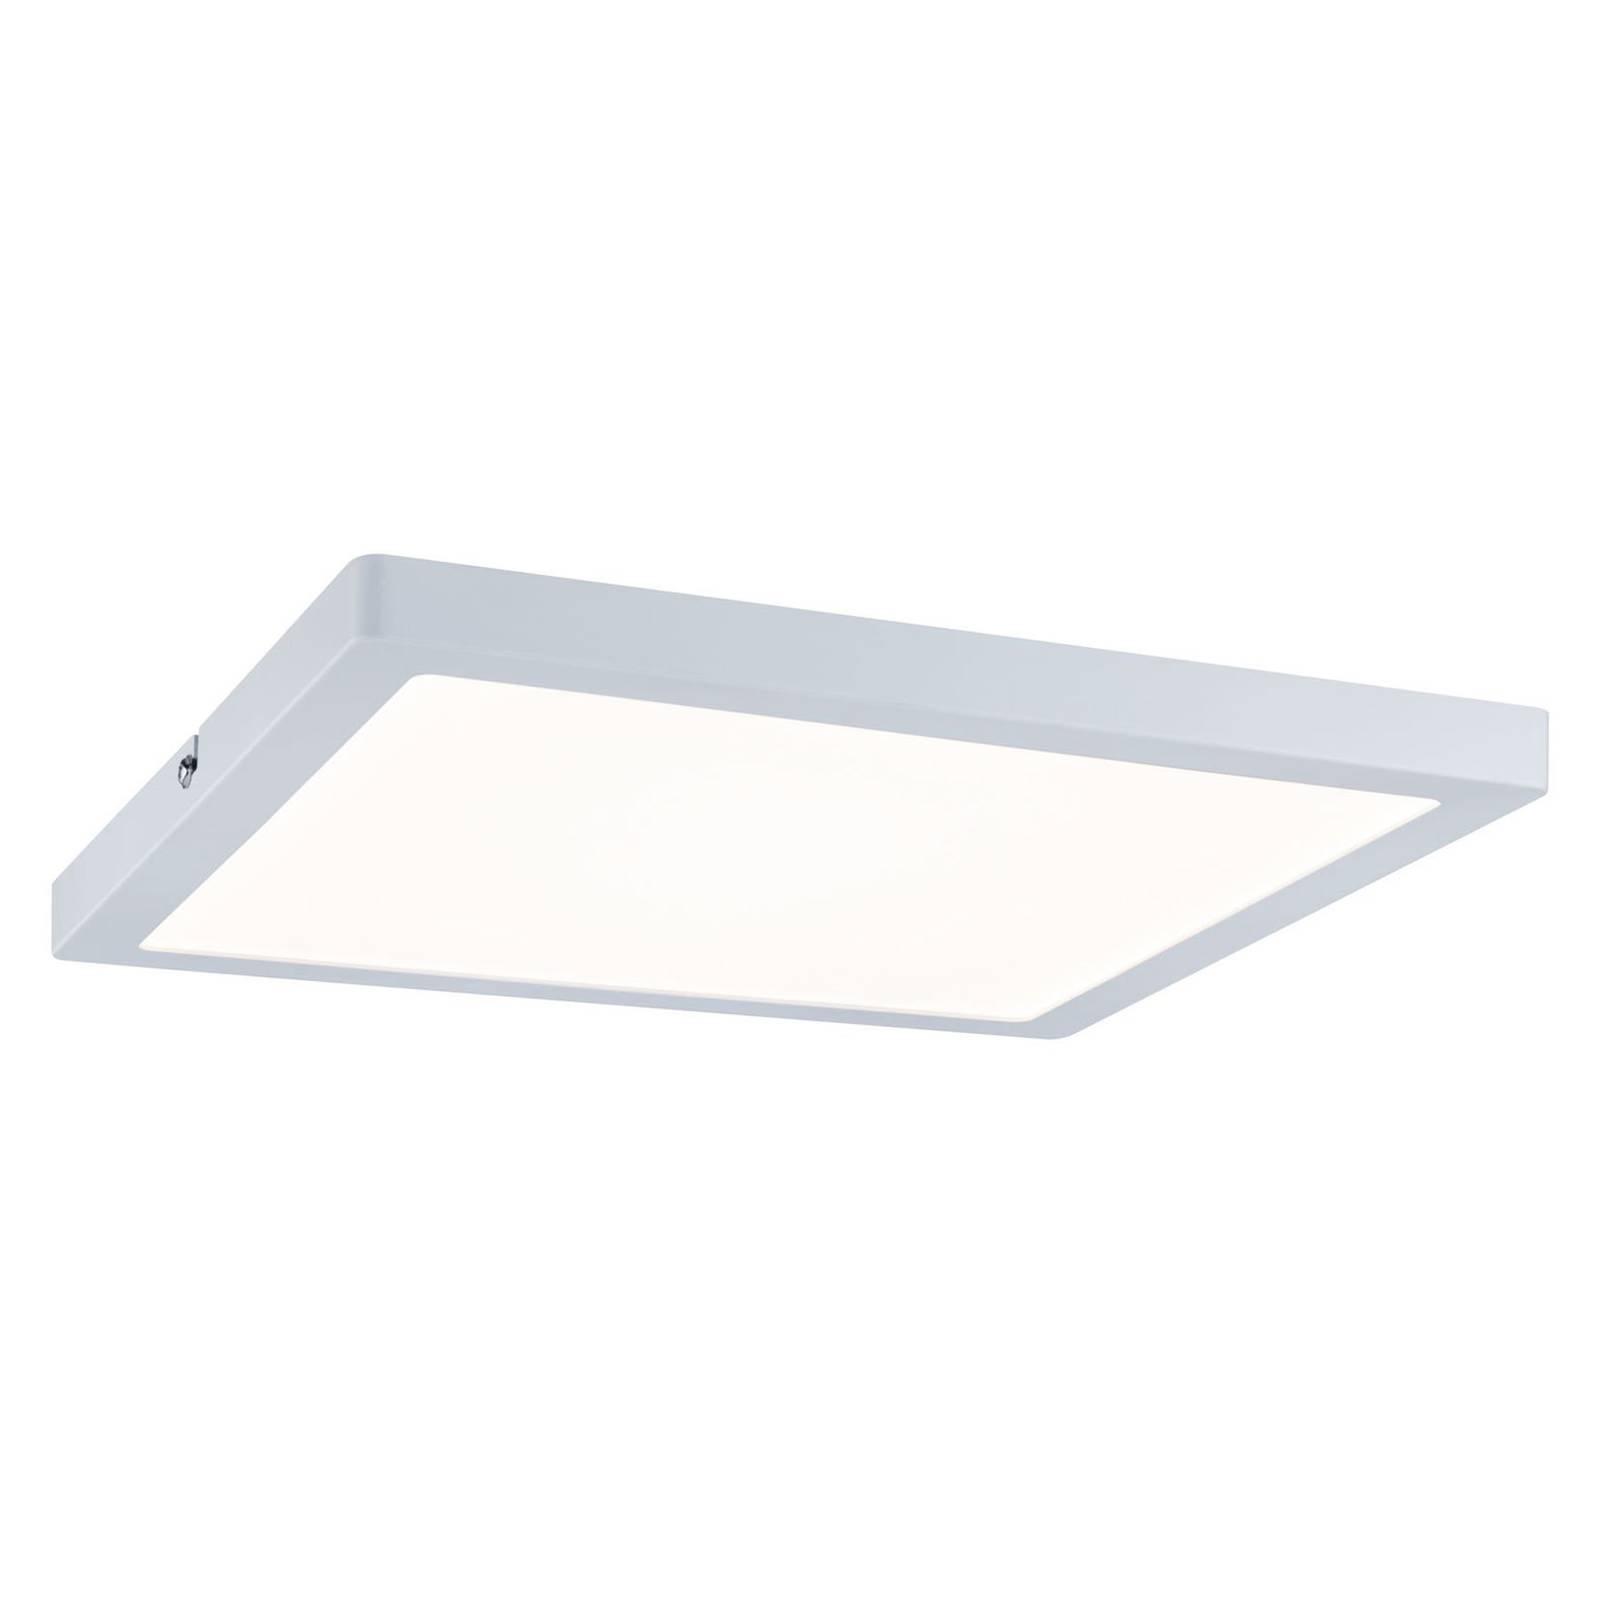 Paulmann Atria LED plafondlamp 30x30 cm wit mat